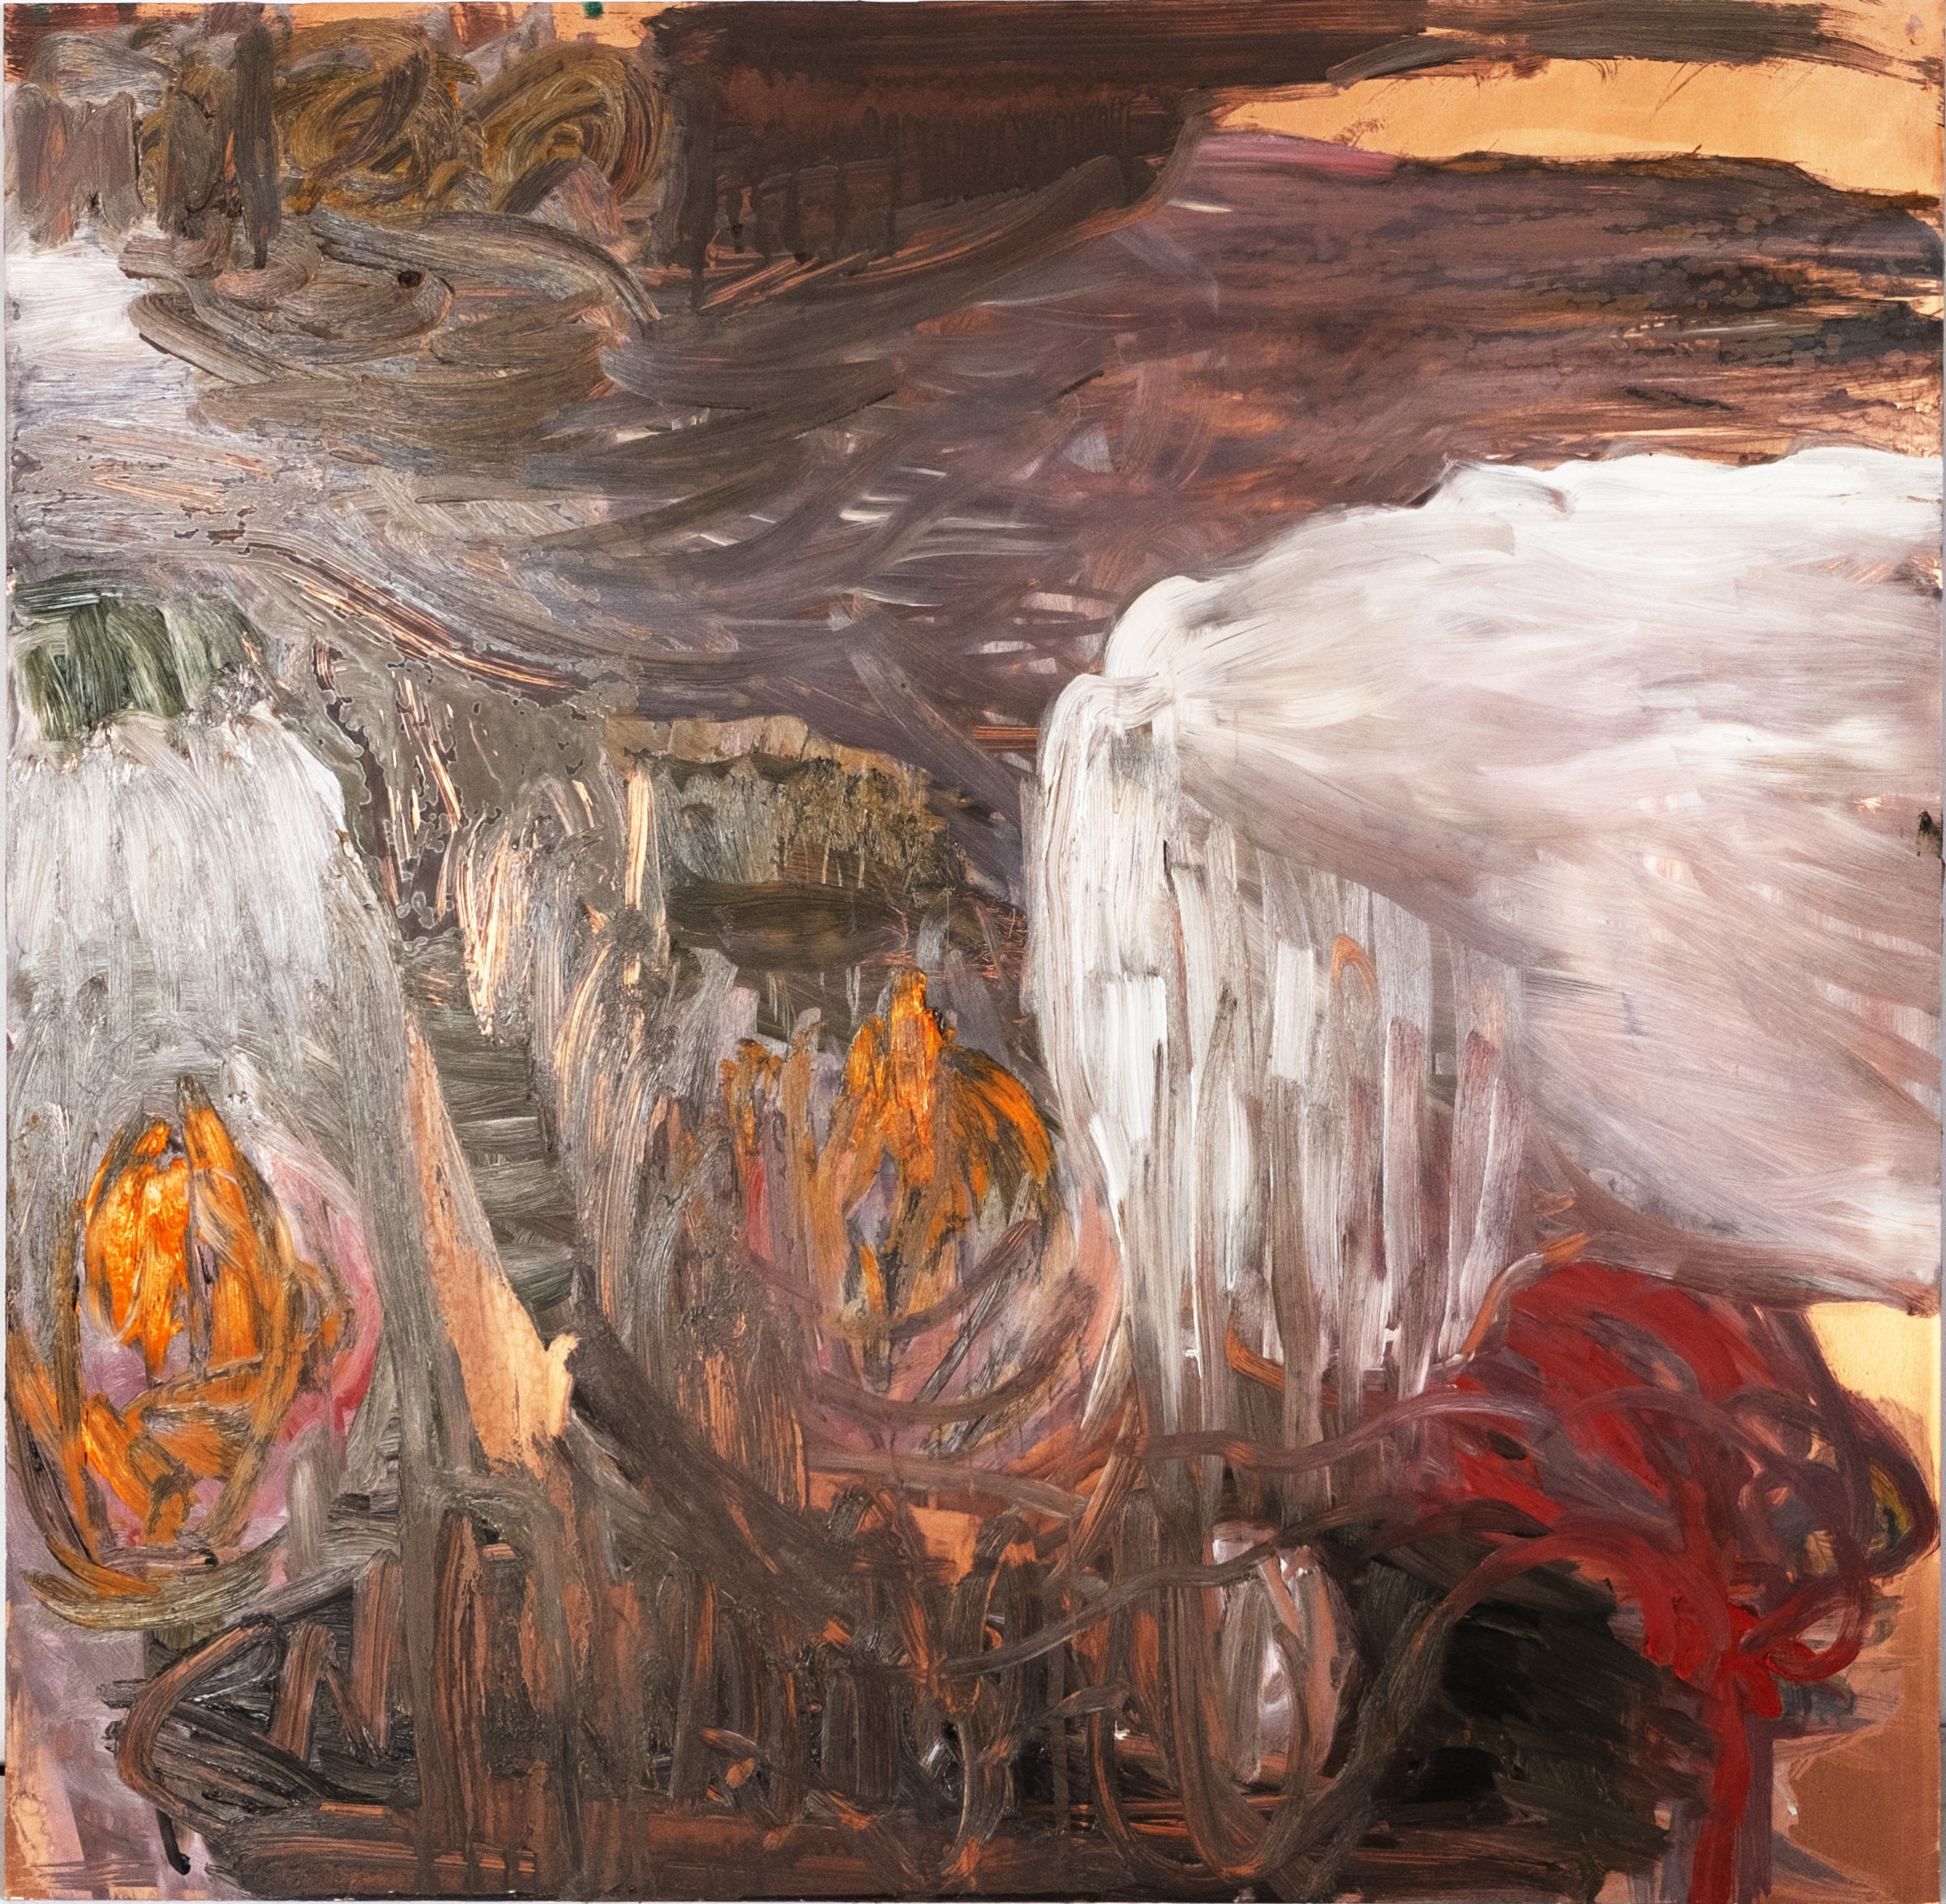 Flow, olja på koppar, 60x60 cm, 2020